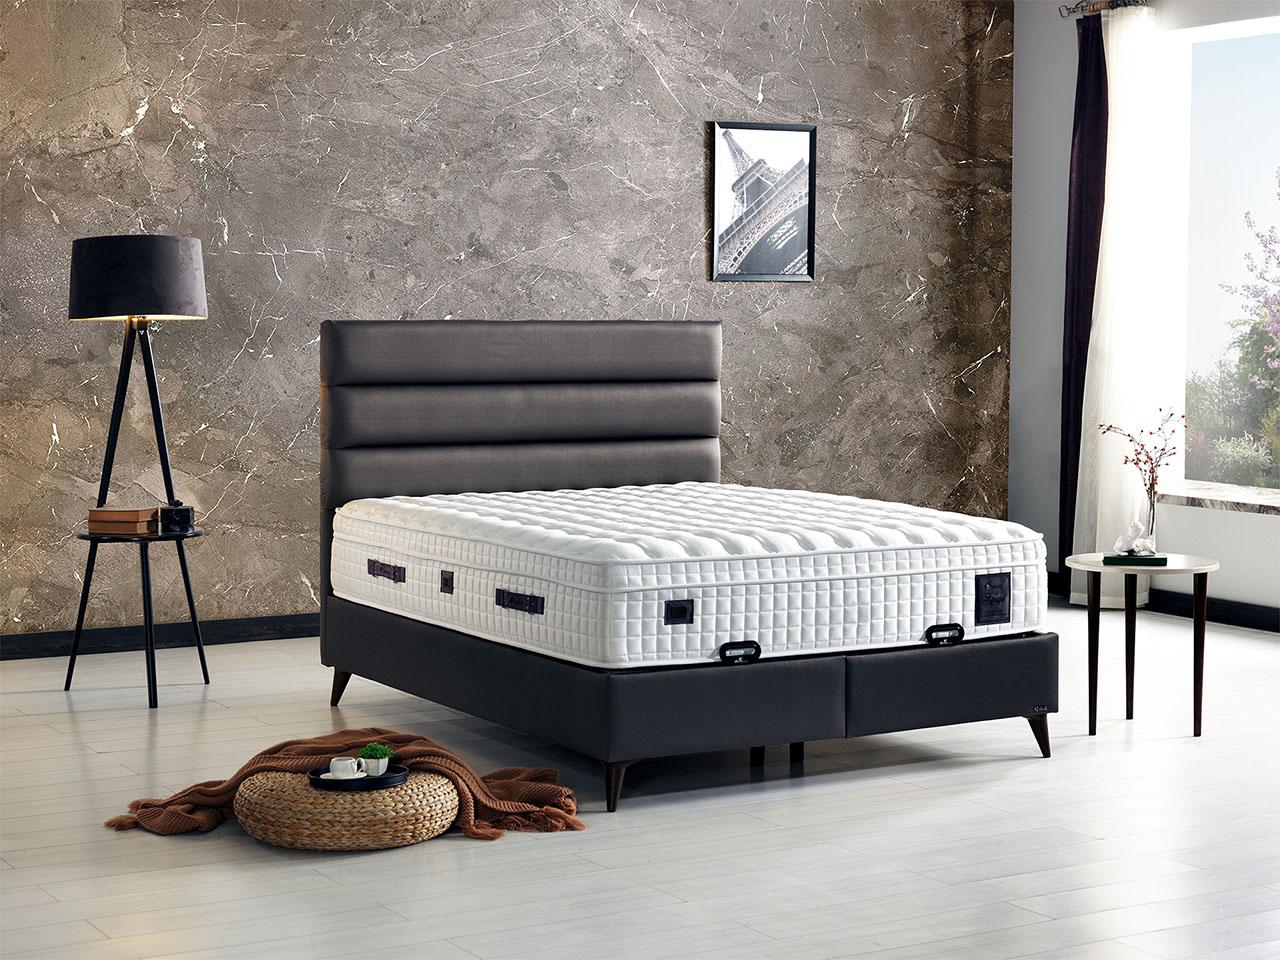 bracni krevet sa tapaciranom bazom i uzglavljem podizni mehanizam prostor za odlaganje